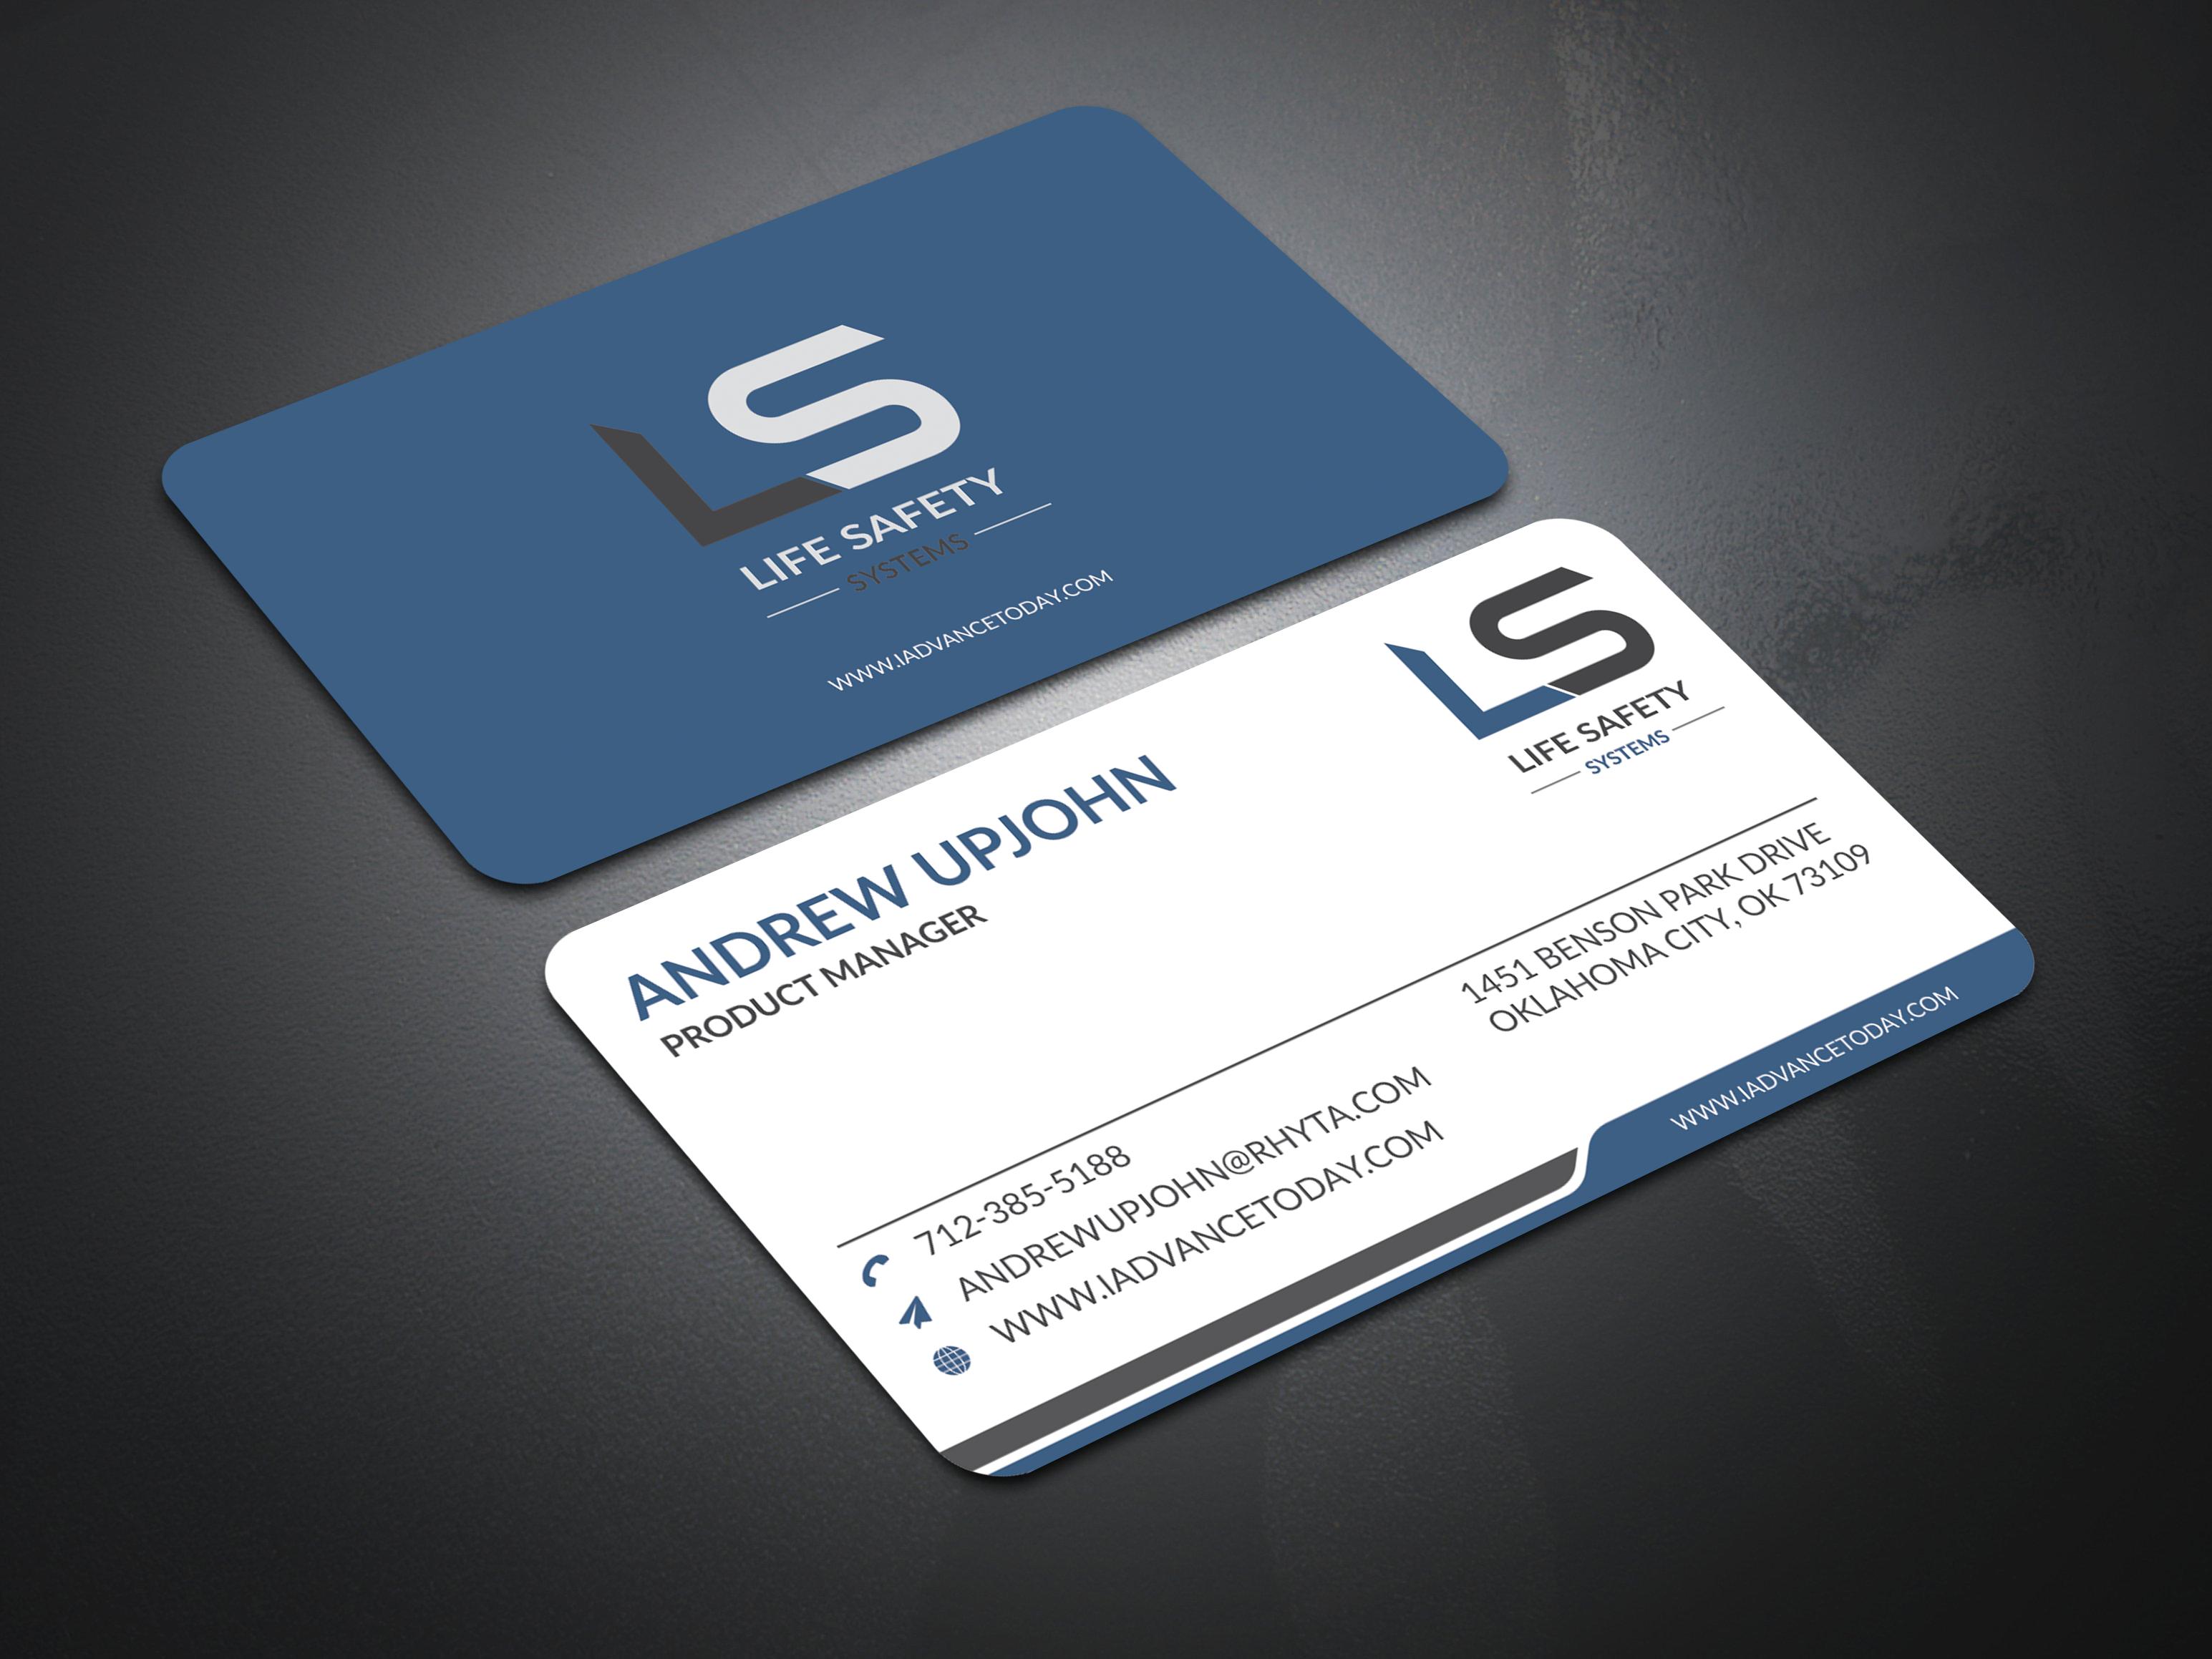 Minimalistic And Elegant Business Card Design